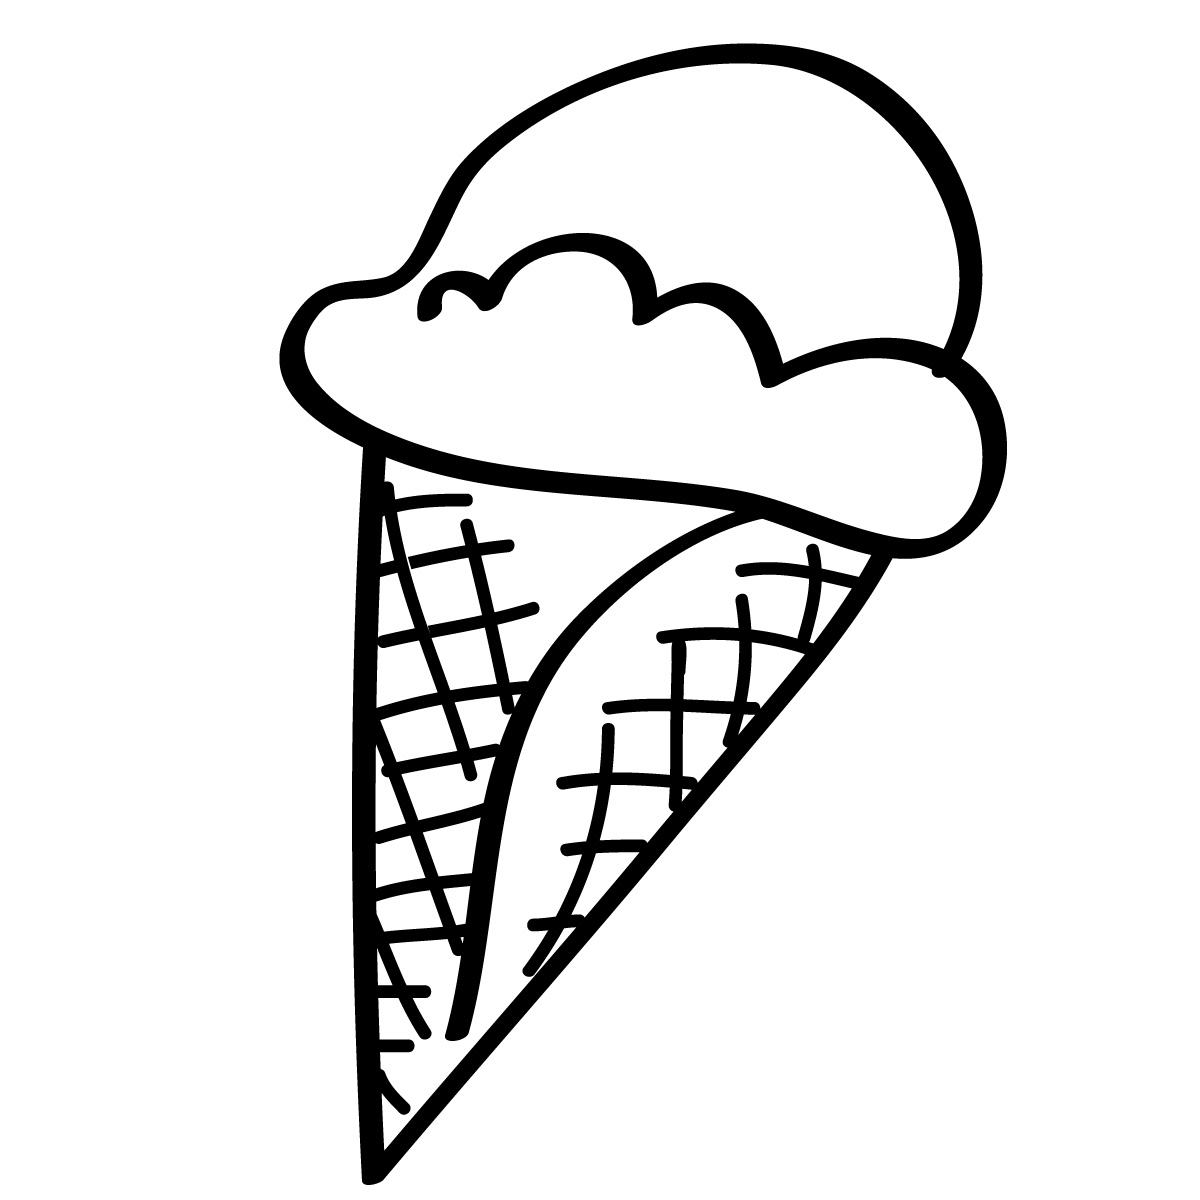 Ice-cream cone drawing